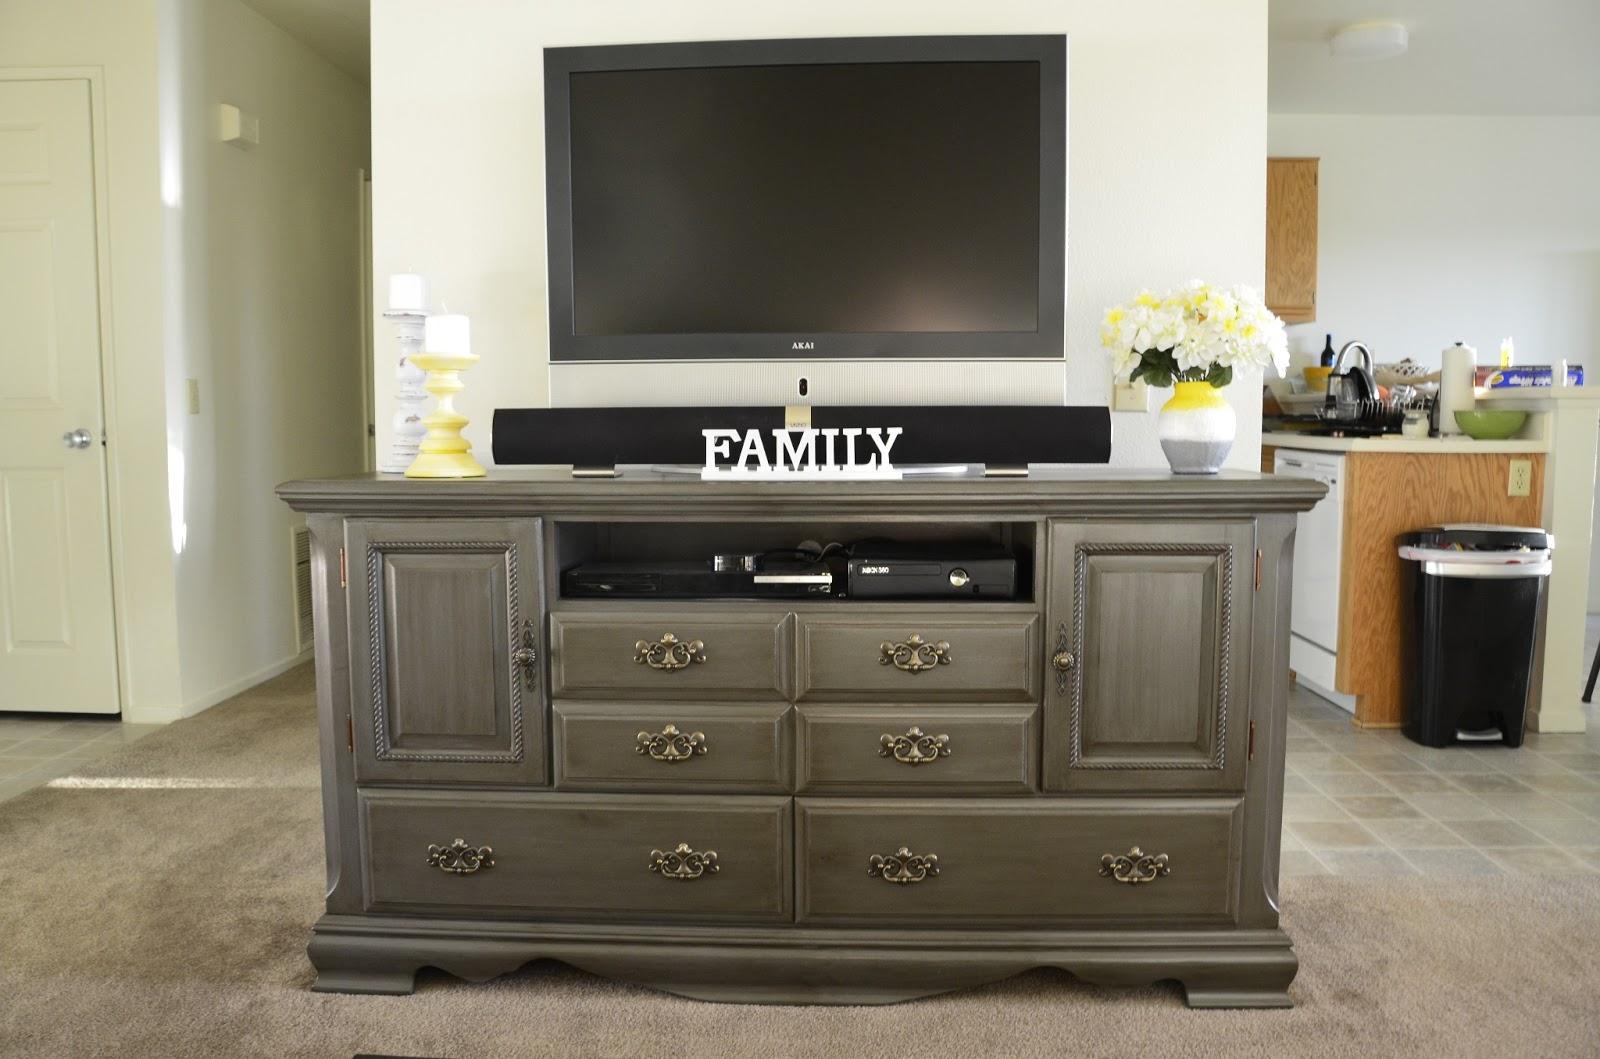 DIY Dresser as TV Stand